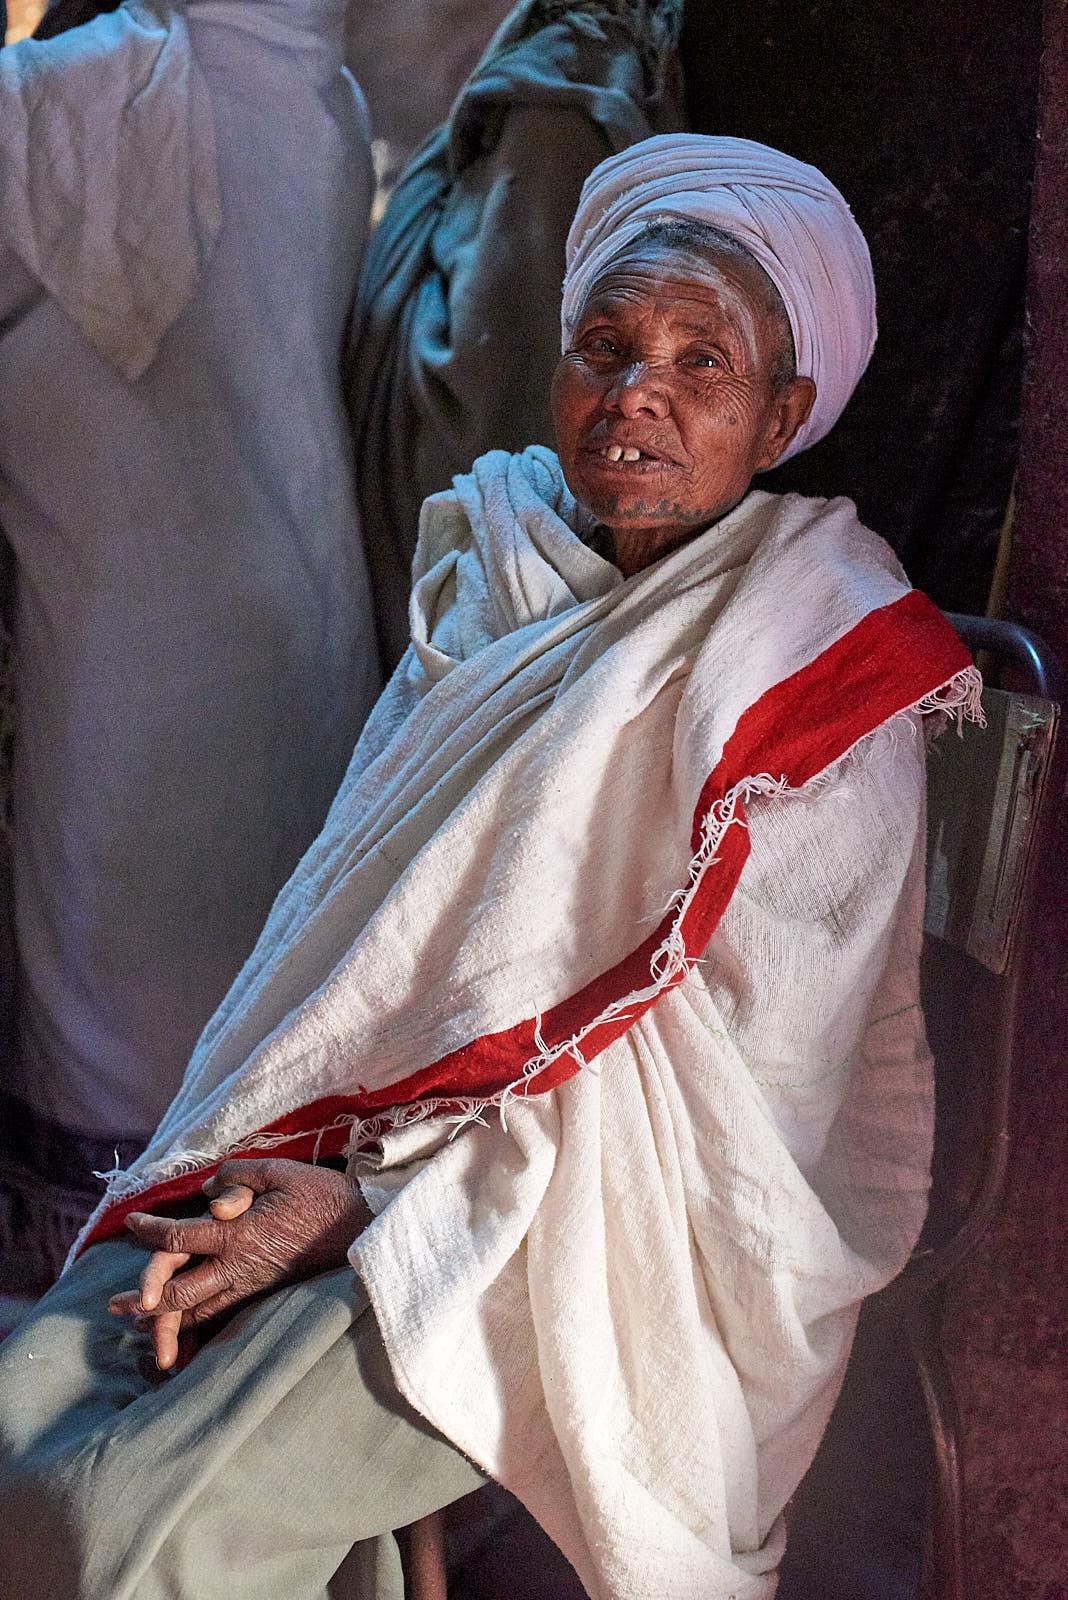 Ethiopian Orthodox pilgrim rests after prayers inside the Church of Saint George, Lalibela, Ethiopia.